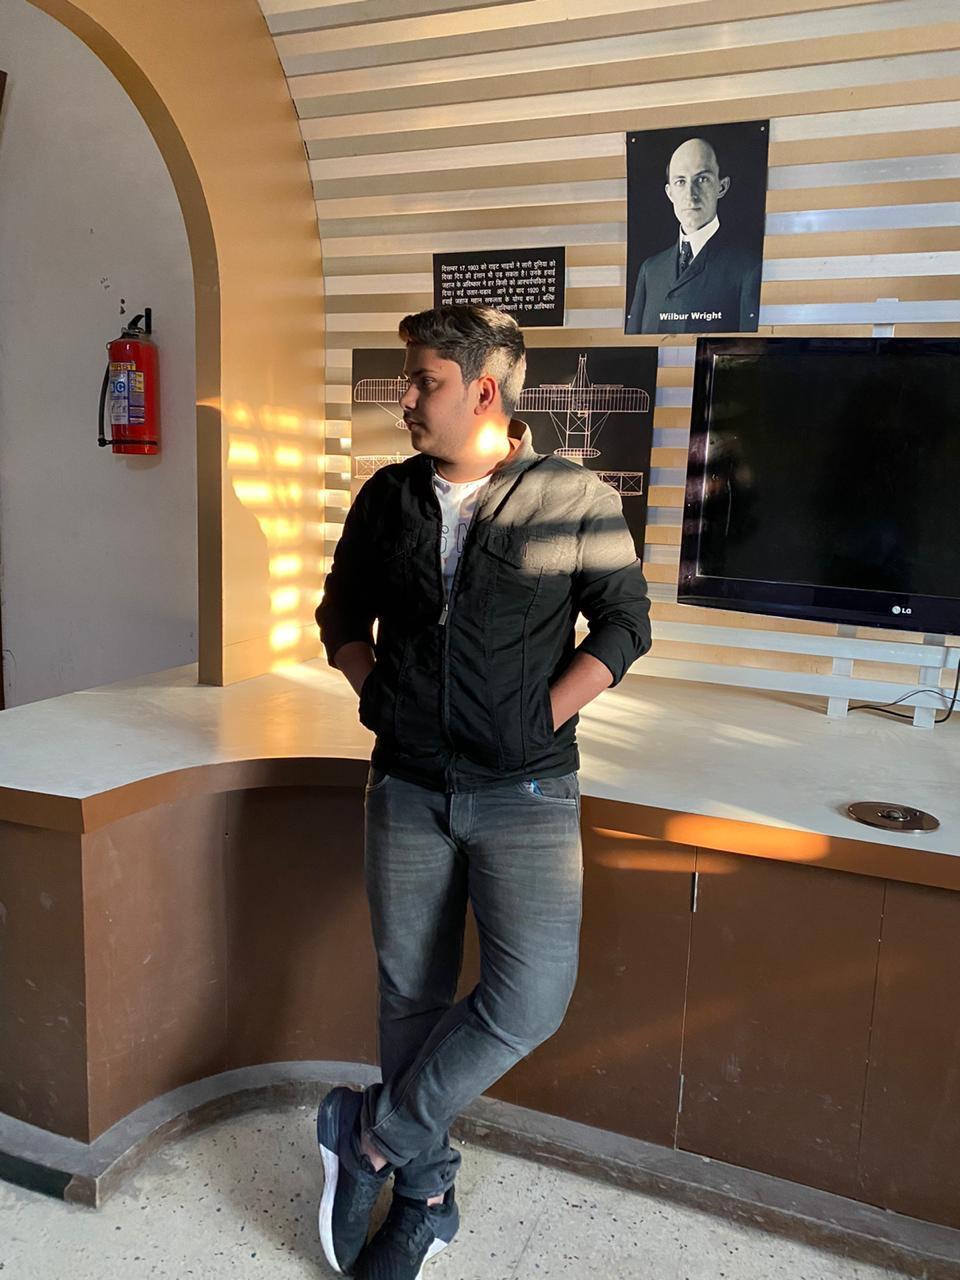 Meet Young Digital Marketing expert Afzal Anis of India, founder of best Digital Marketing company GRAVMO DIGITAL.